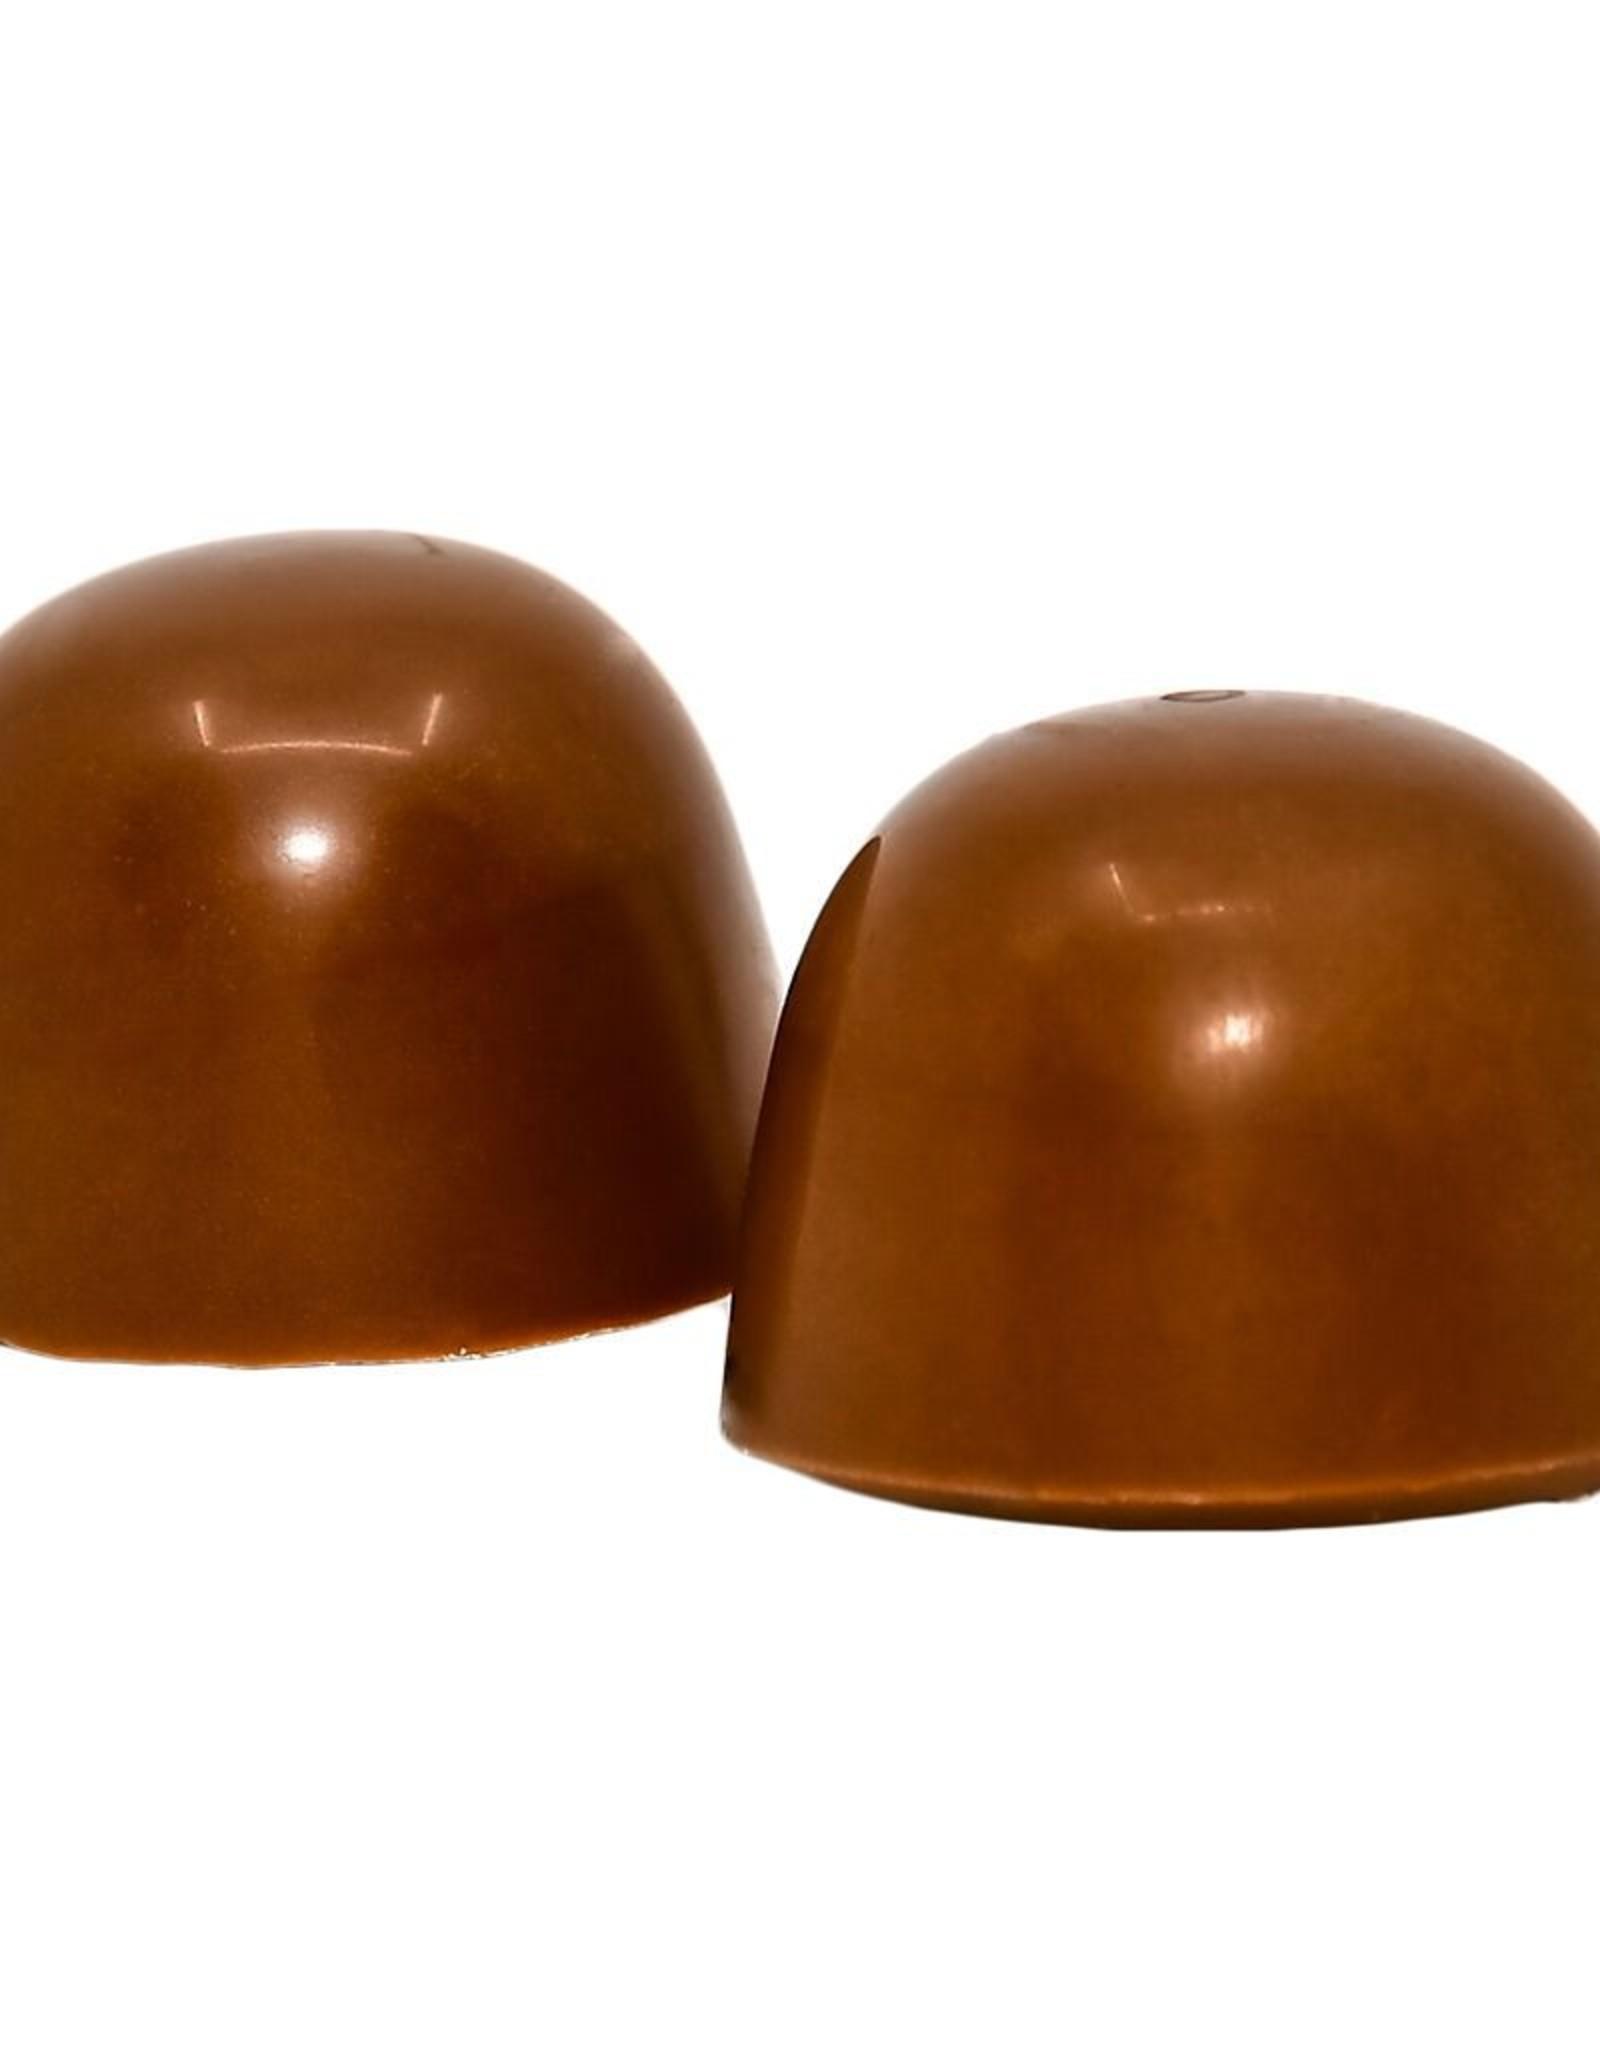 Fireside - Milk Chocolate Duo